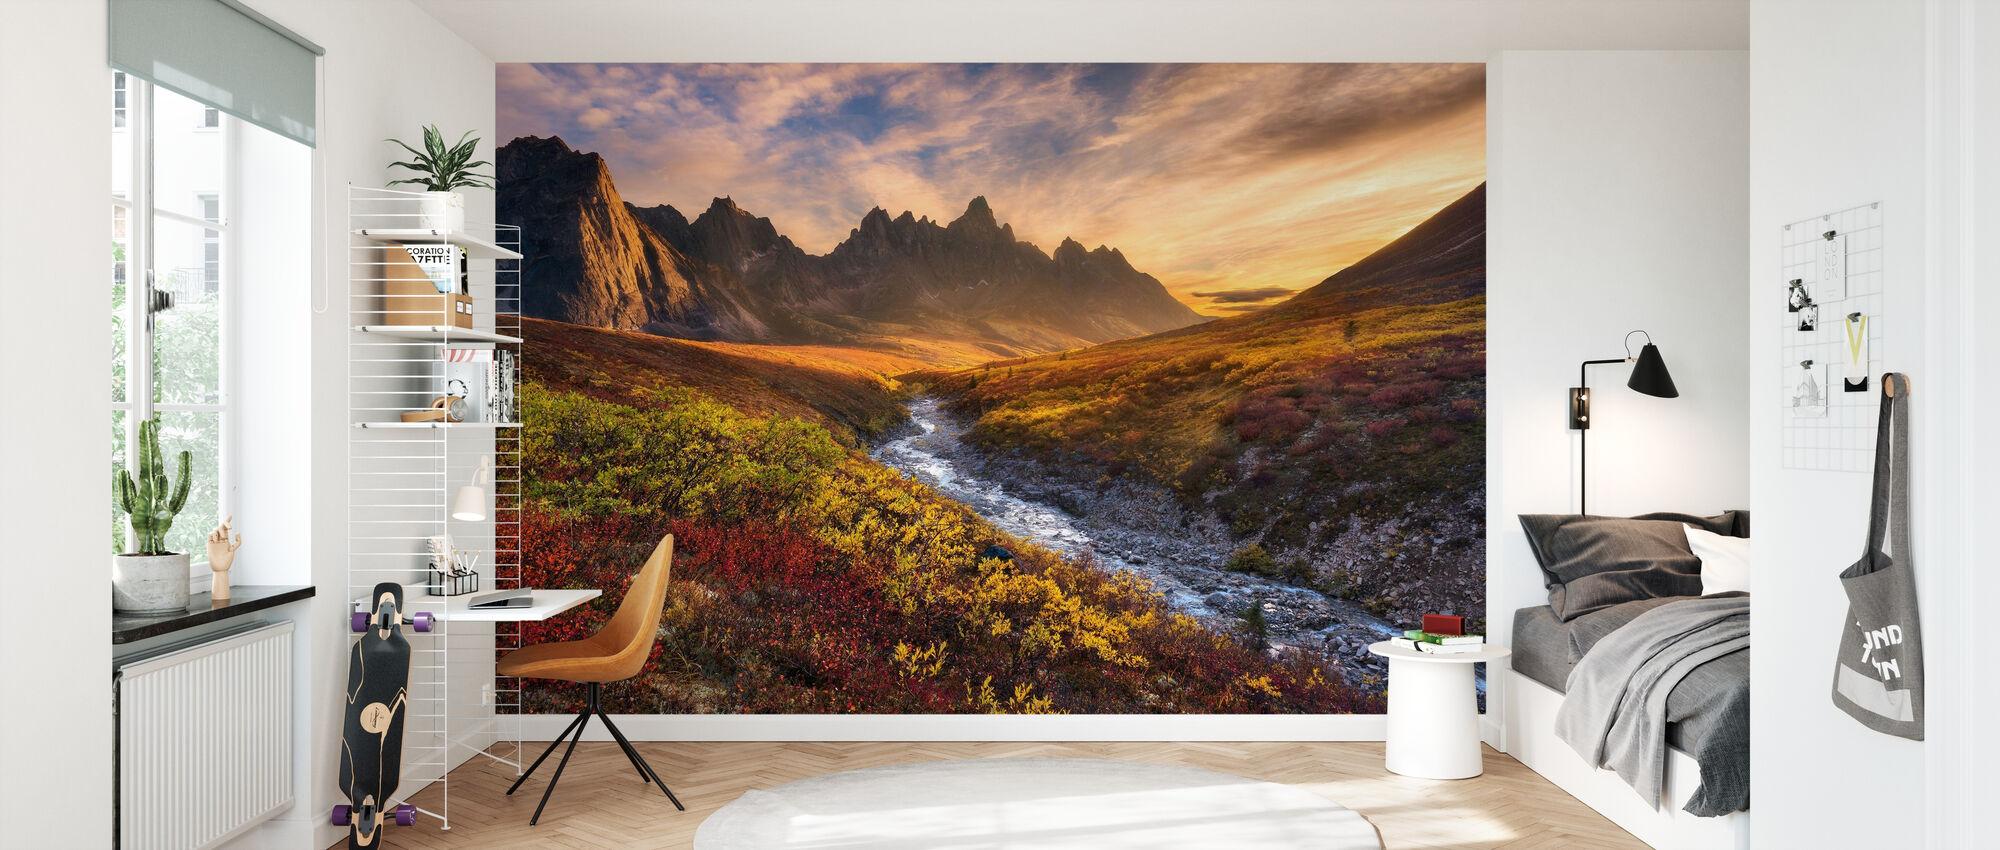 Mountain Paradise - Wallpaper - Kids Room